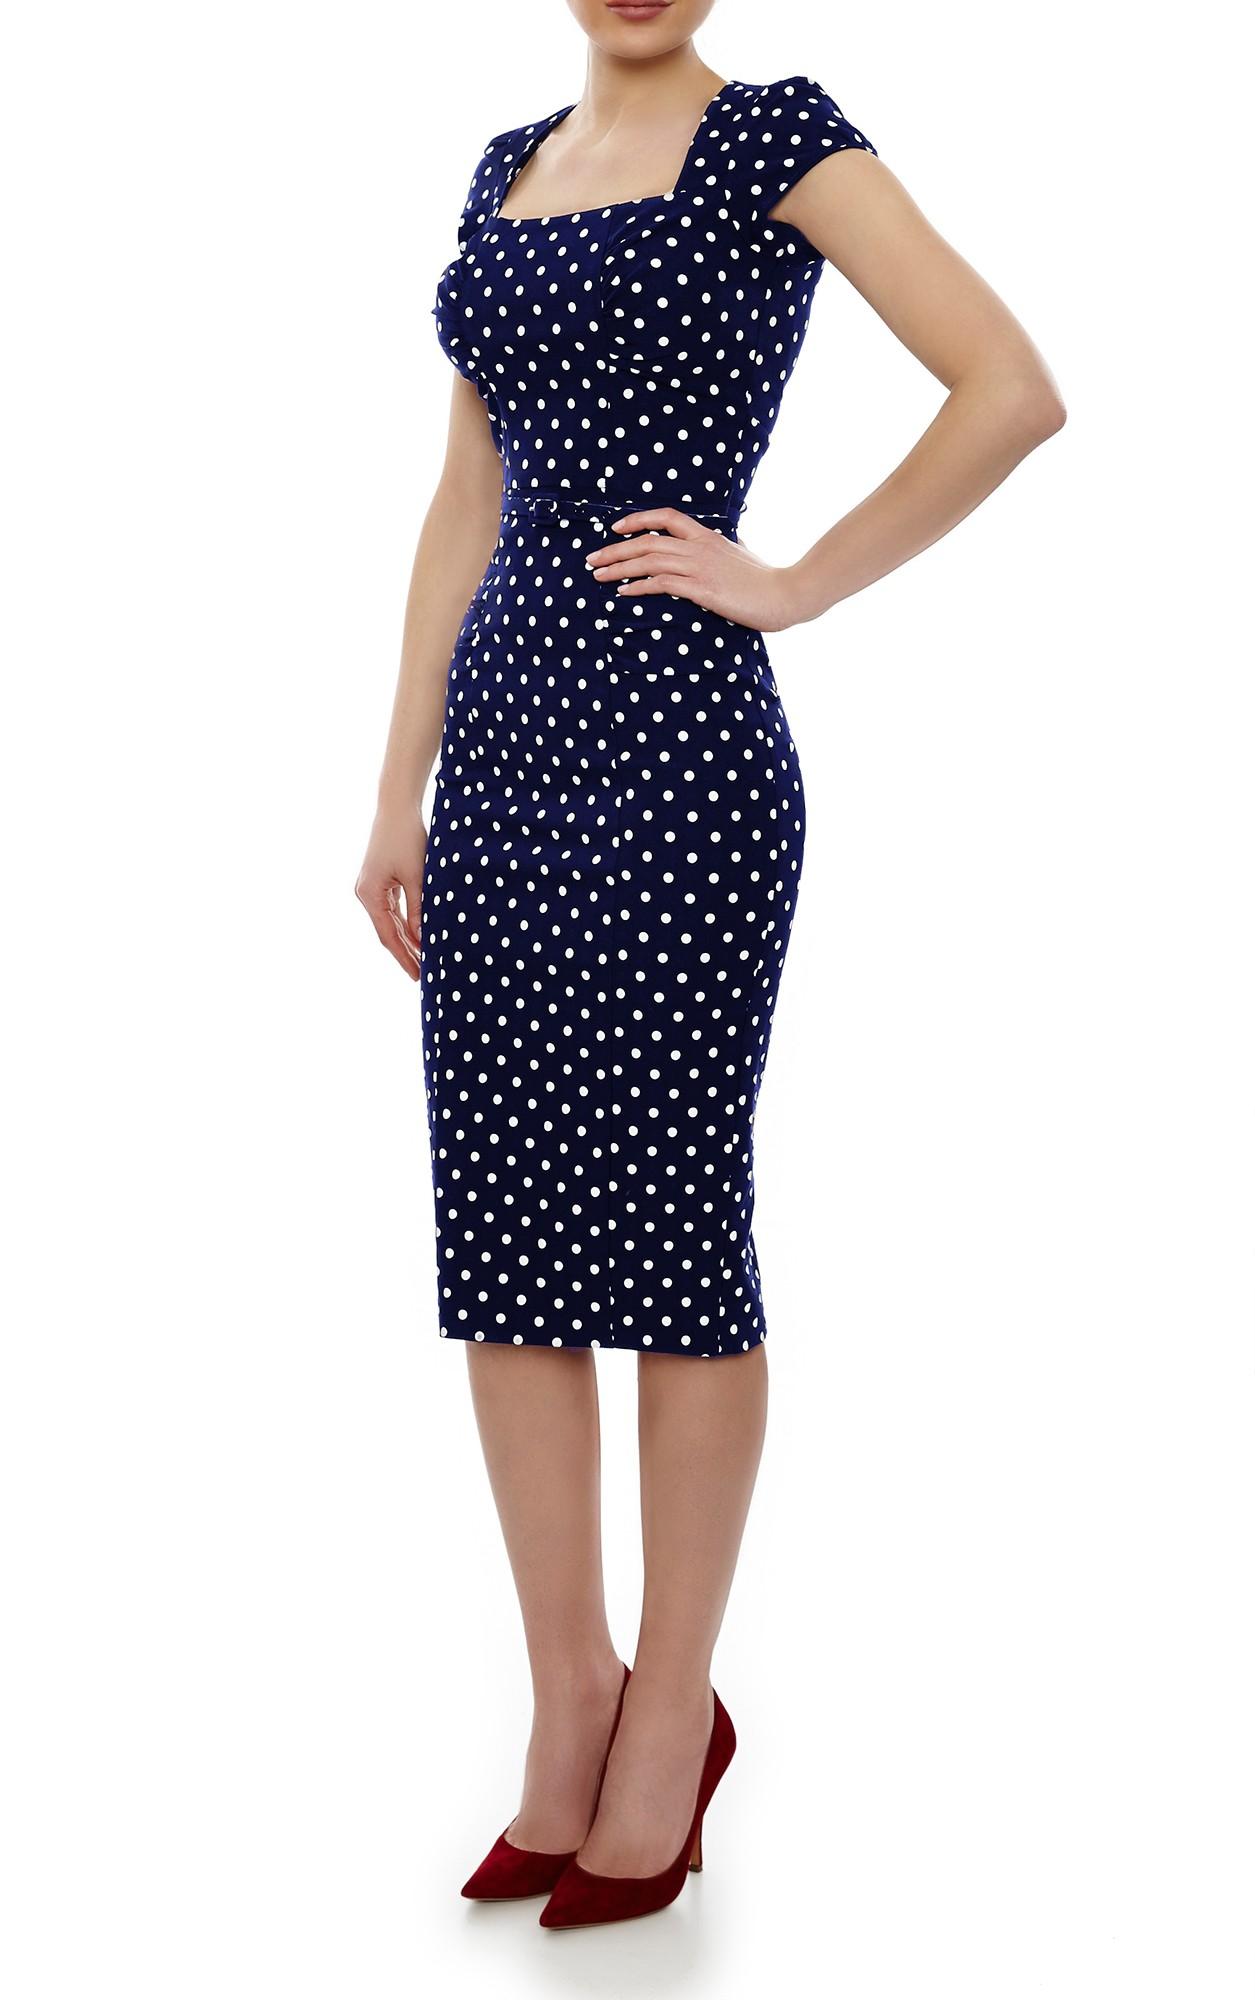 casual polka dot dress photo - 1